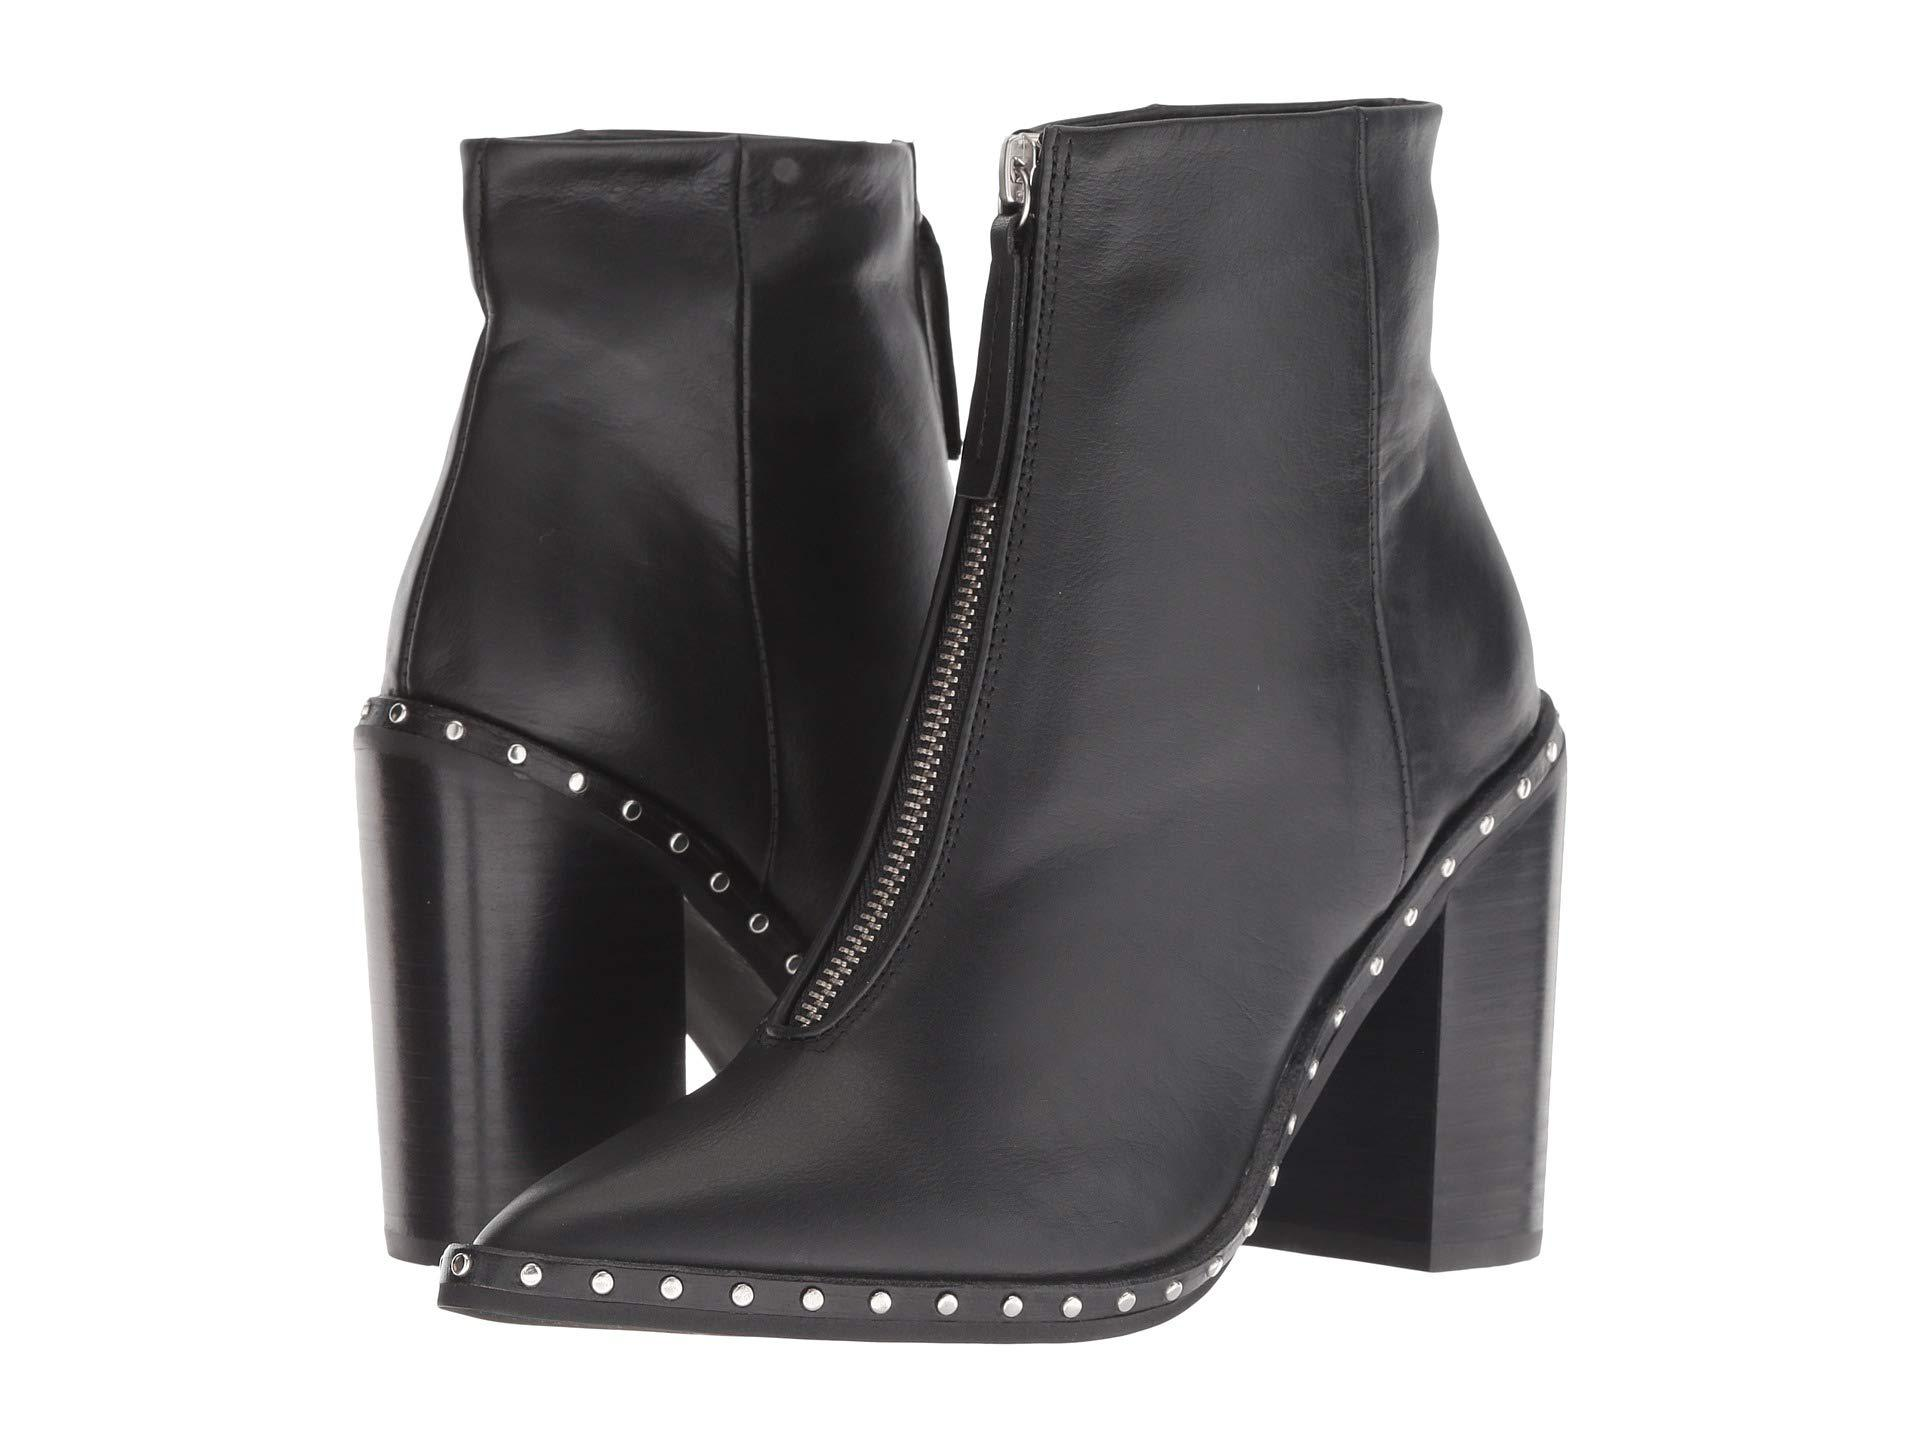 In Women s Leather Lyst Sol Boot Boots Sana Axel Rrzv4x Black qxTEY0 457c97b17c3